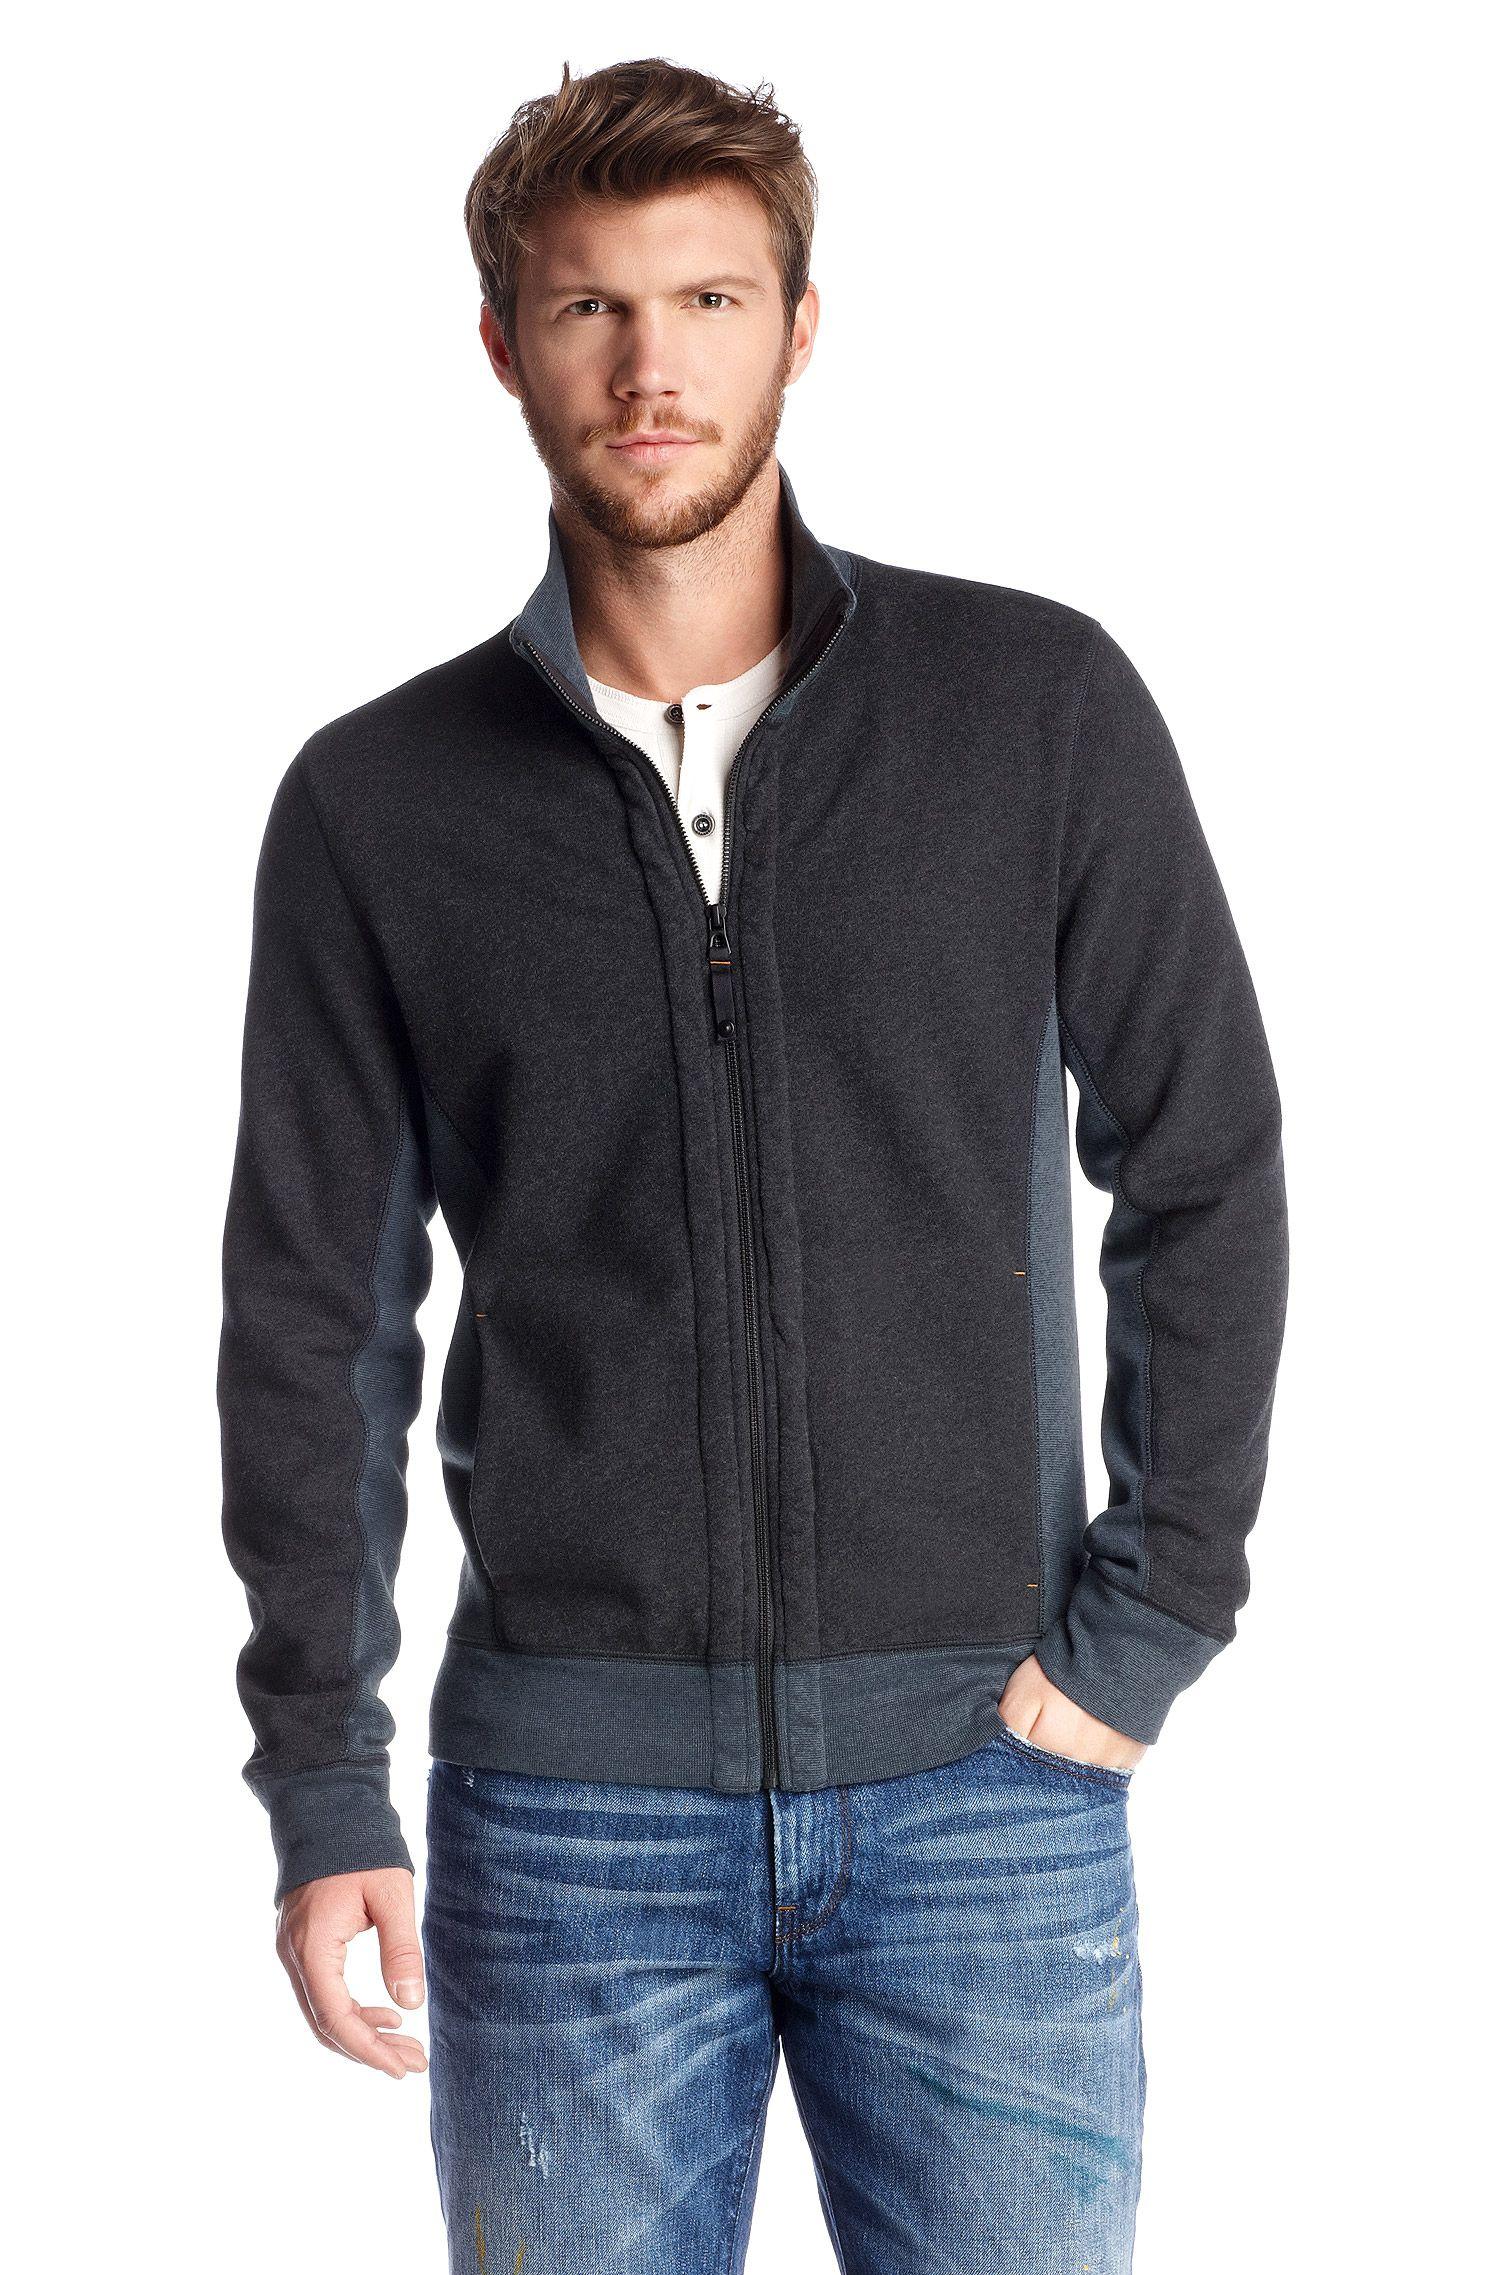 Sweatshirtvest ´Zparks` met opstaande kraag